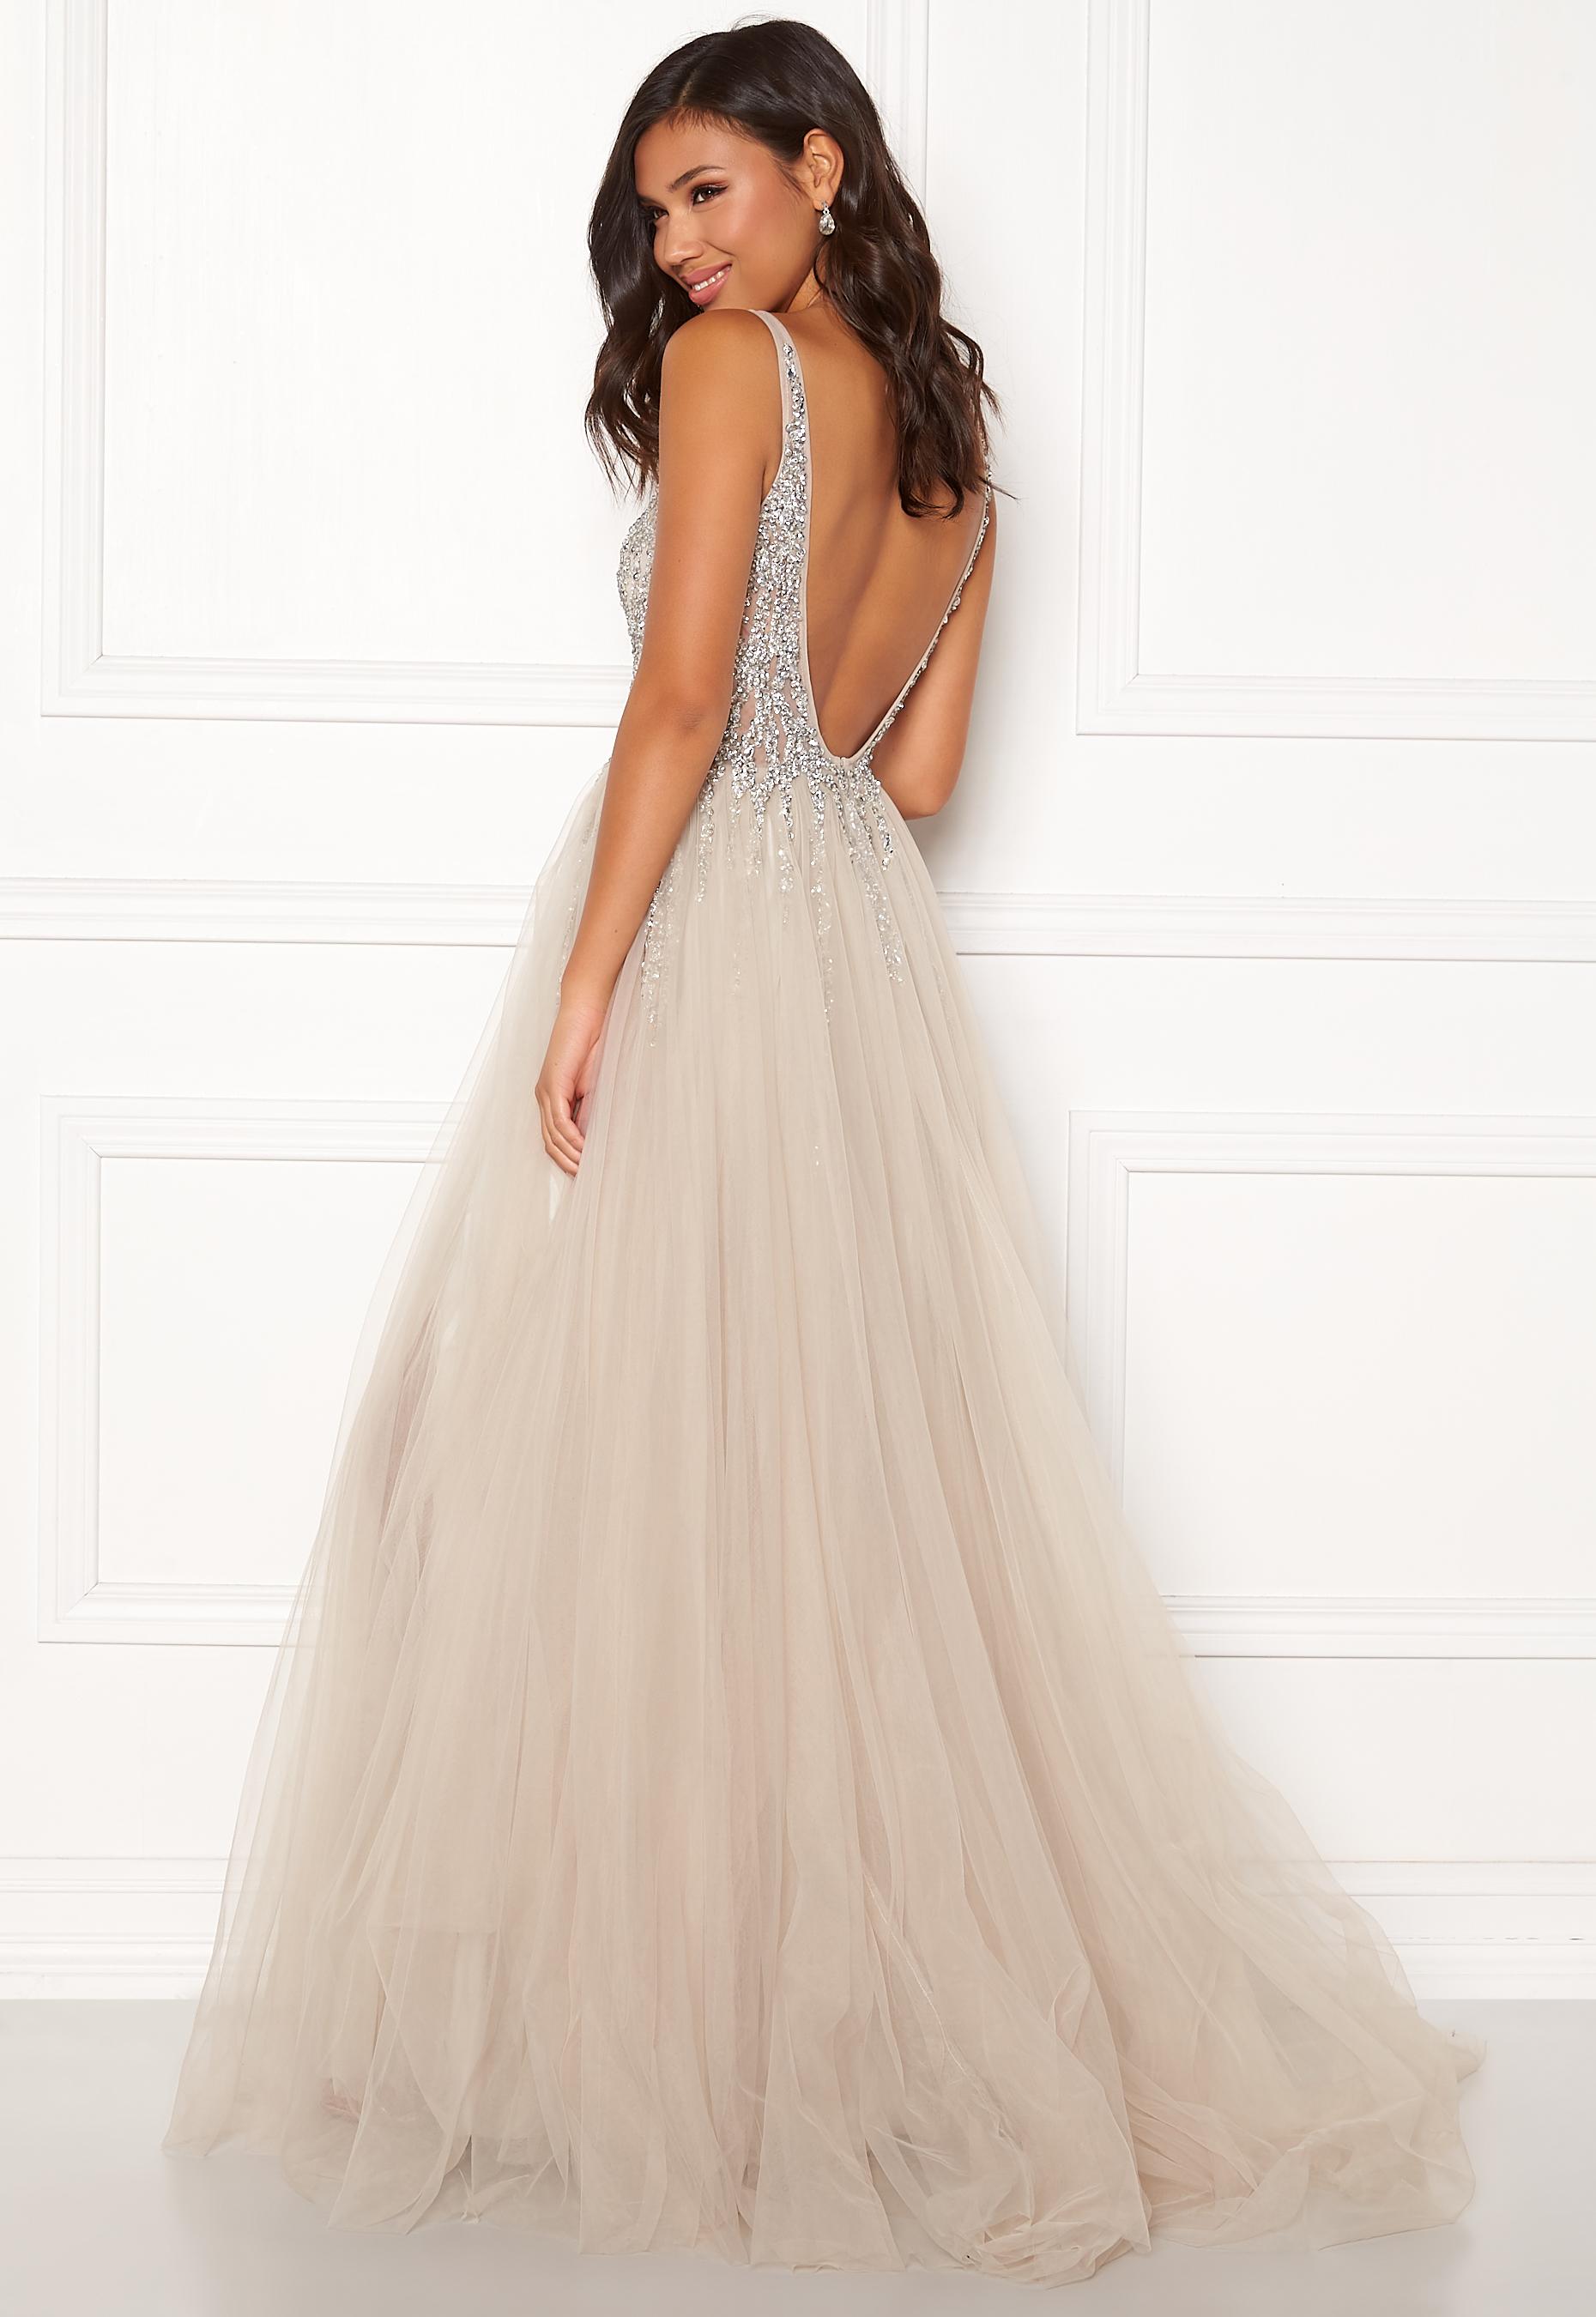 daf303fb Christian Koehlert Sparkling Tulle Dream Dress Ghost Gray - Bubbleroom